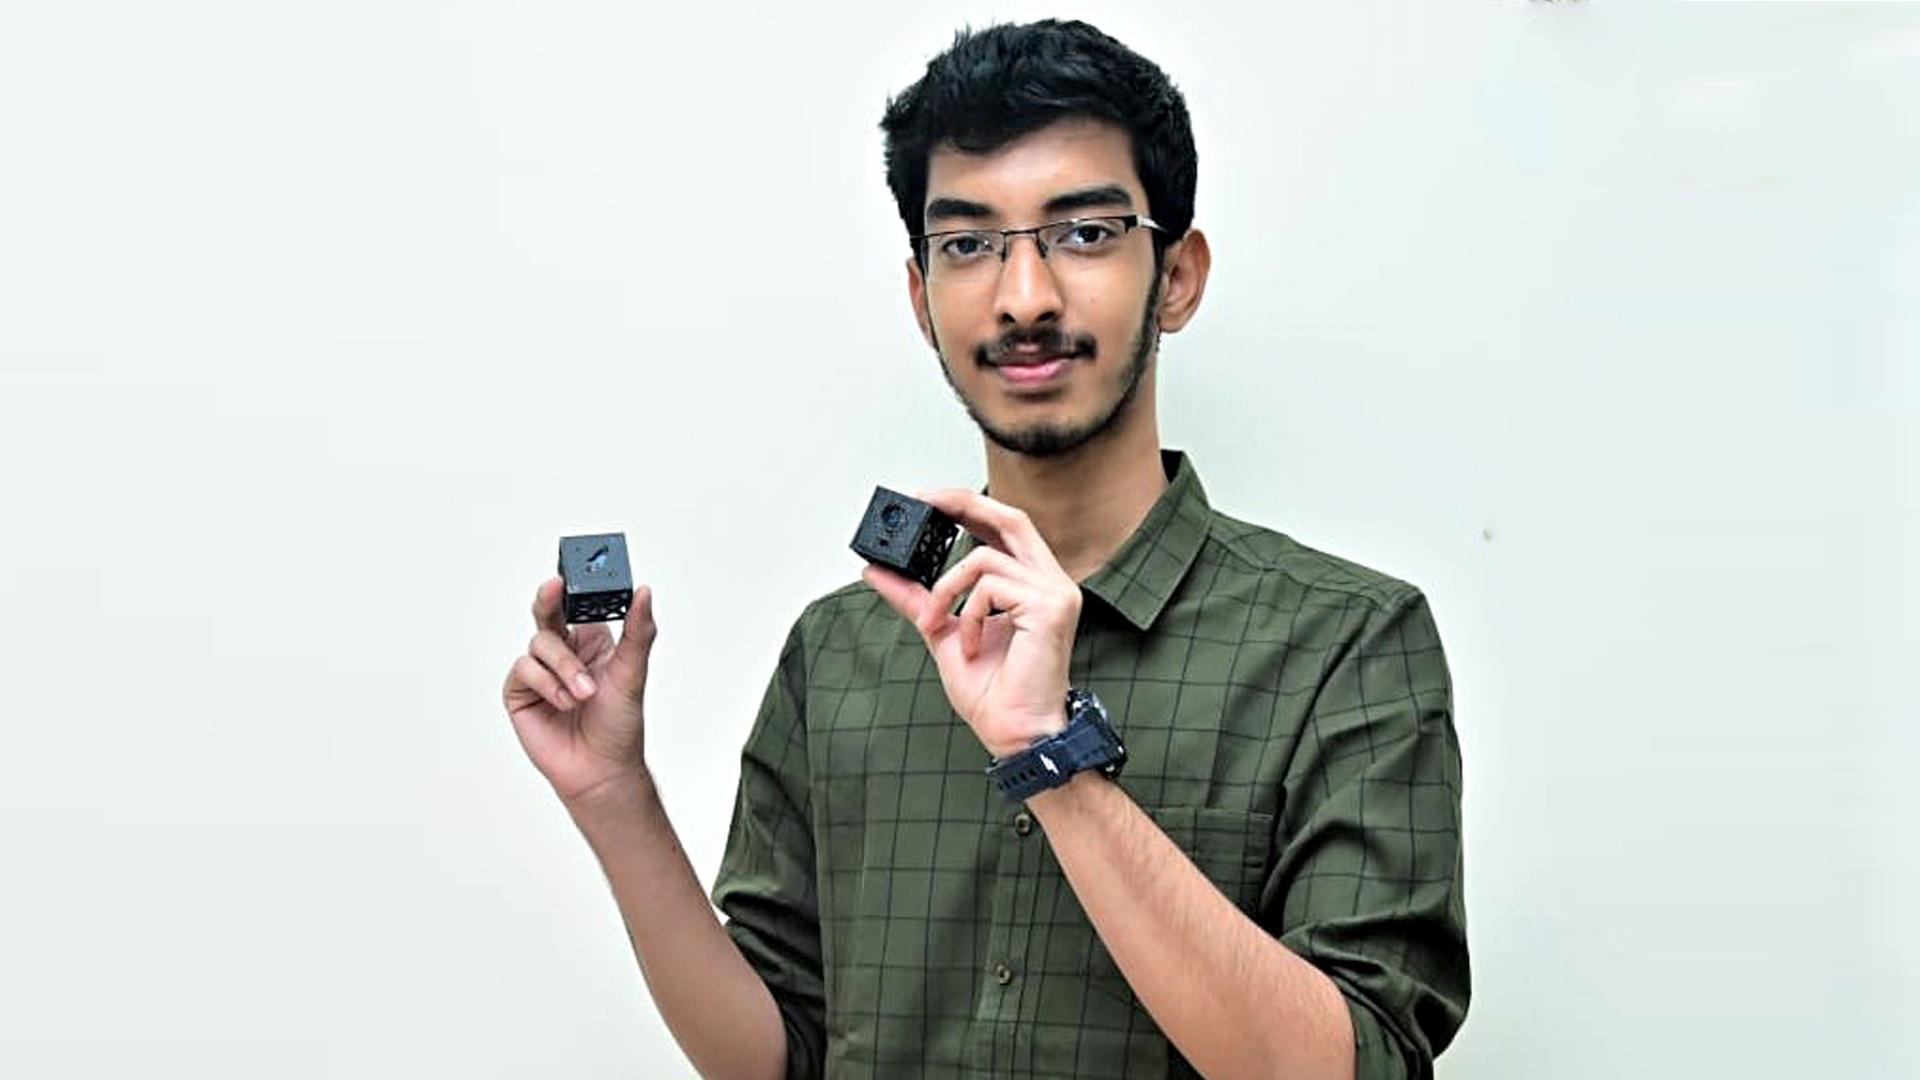 One Small Step: Teen Student's Tiny Femto Satellite Chosen by NASA